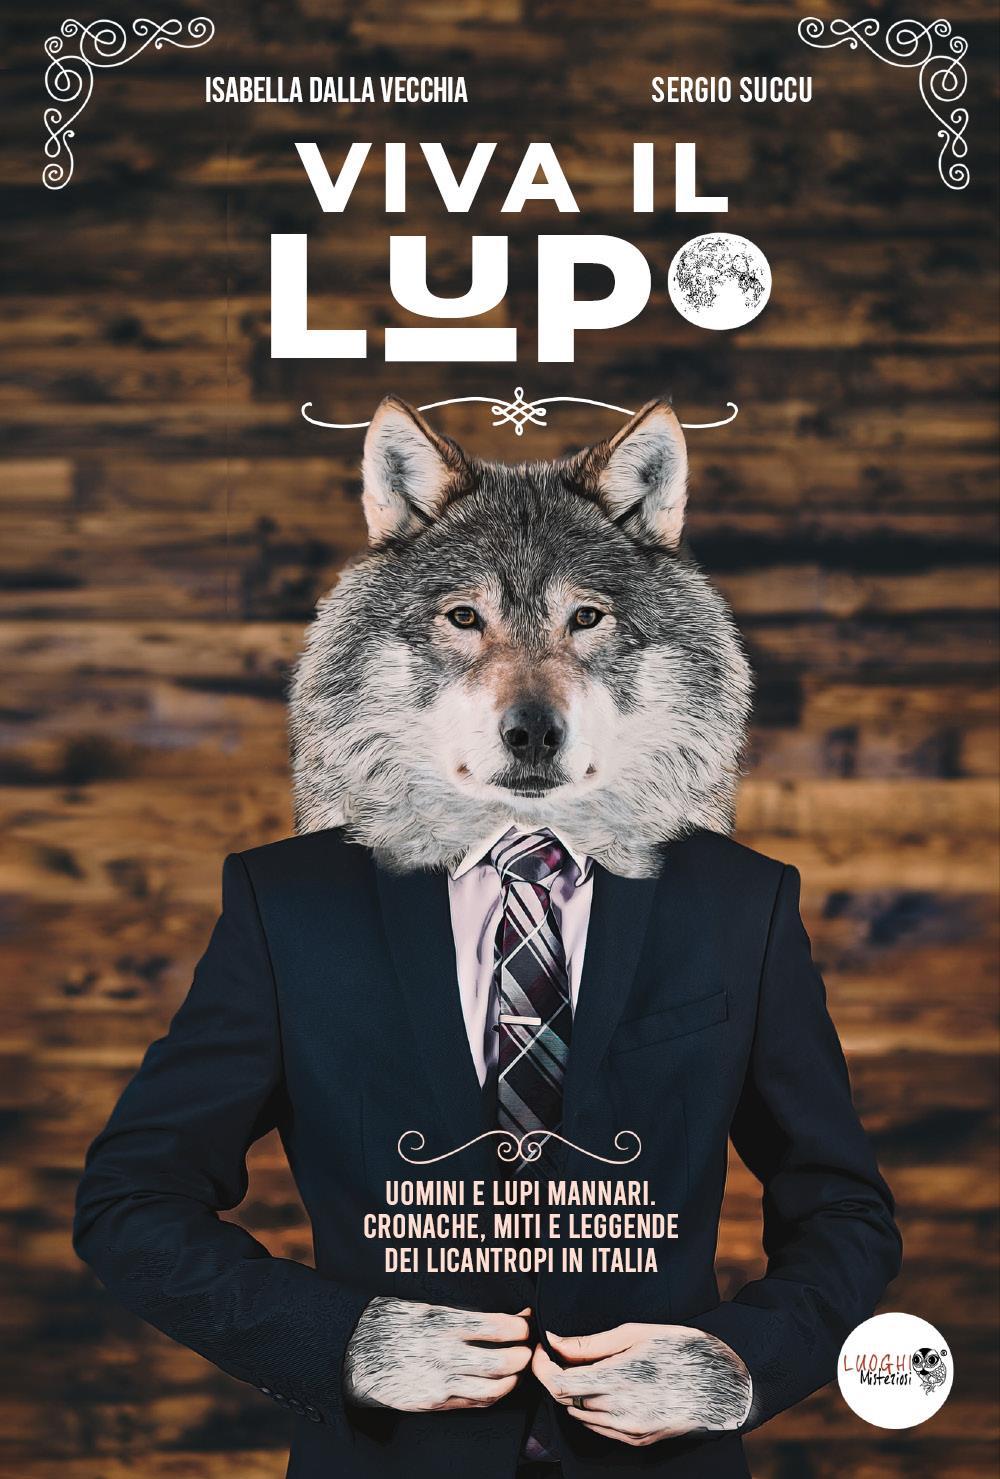 Viva il lupo